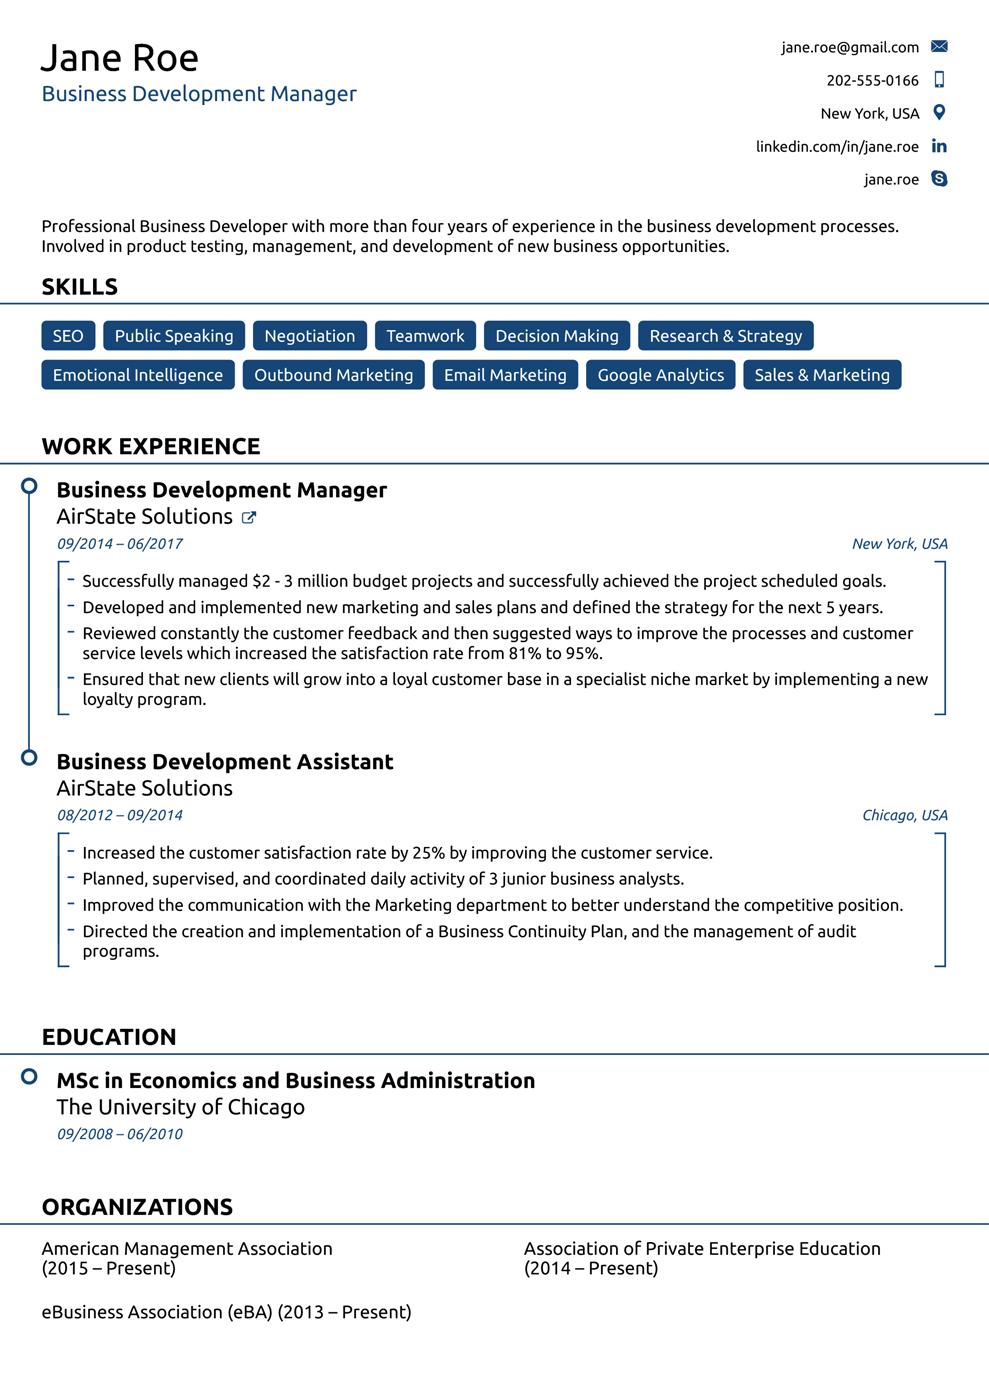 Resume Template Free Modern Resume Template resume template free|wikiresume.com